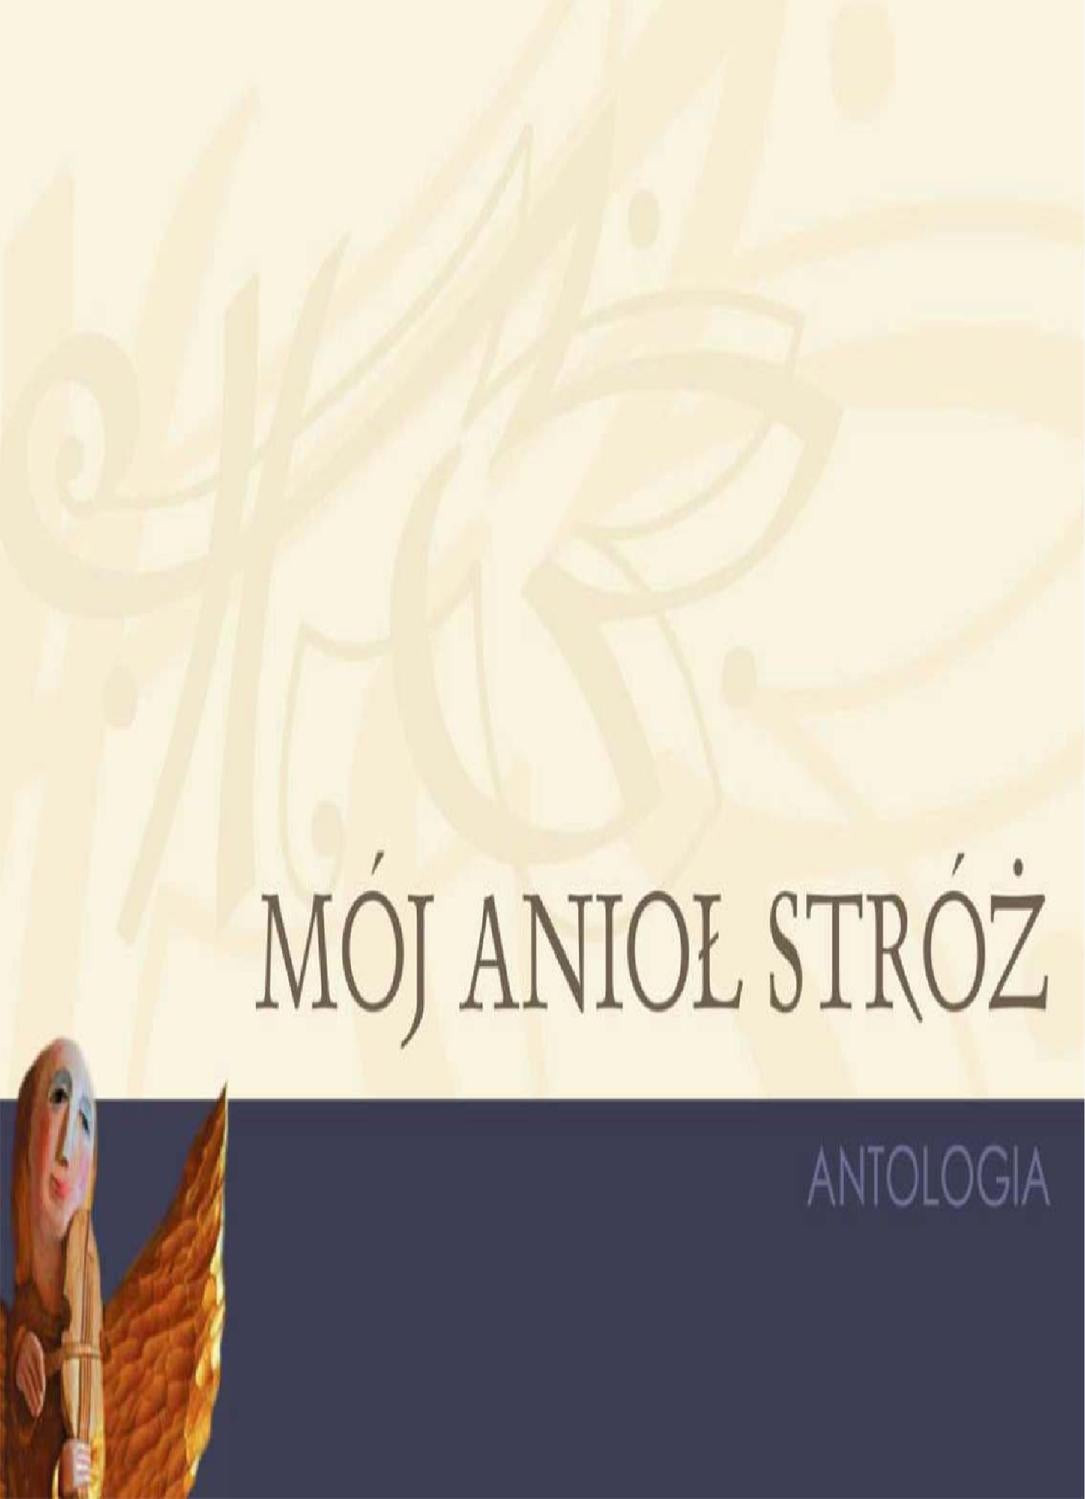 Mój Anioł Stróż Antologia By Granicepl Issuu